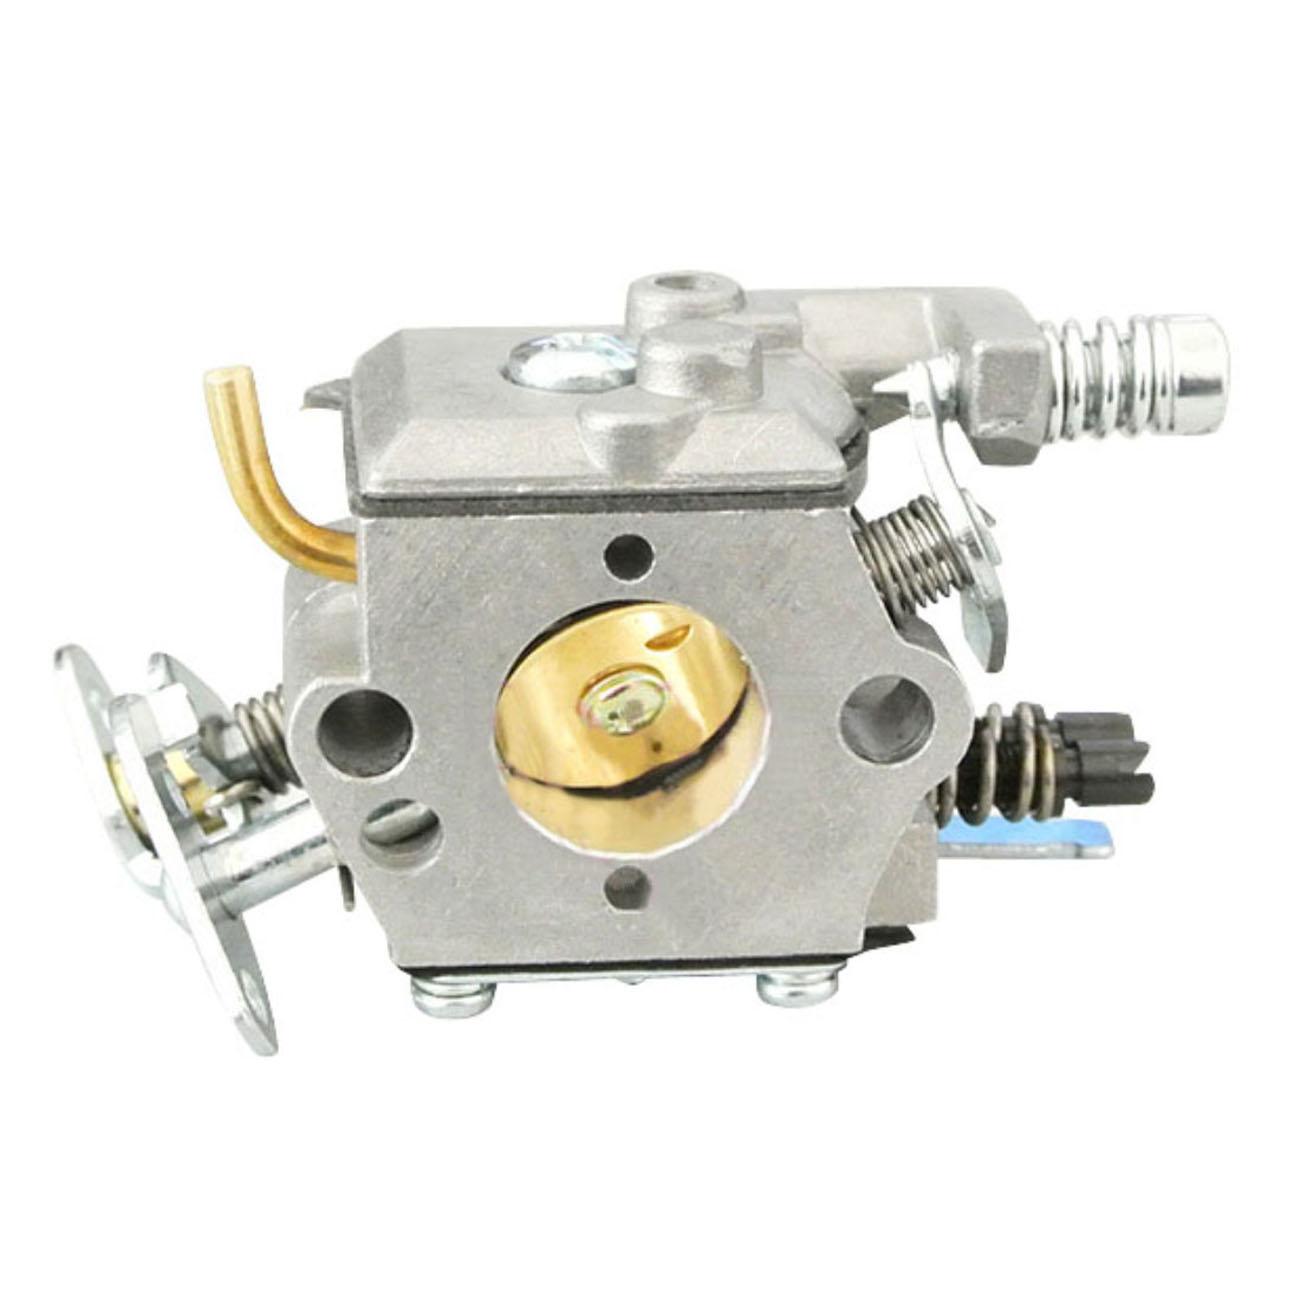 Carburetor Fit HUSQVARNA 36 41 136 137 137E 141 142 Chainsaw Zama C1Q-W29E Carb недорого